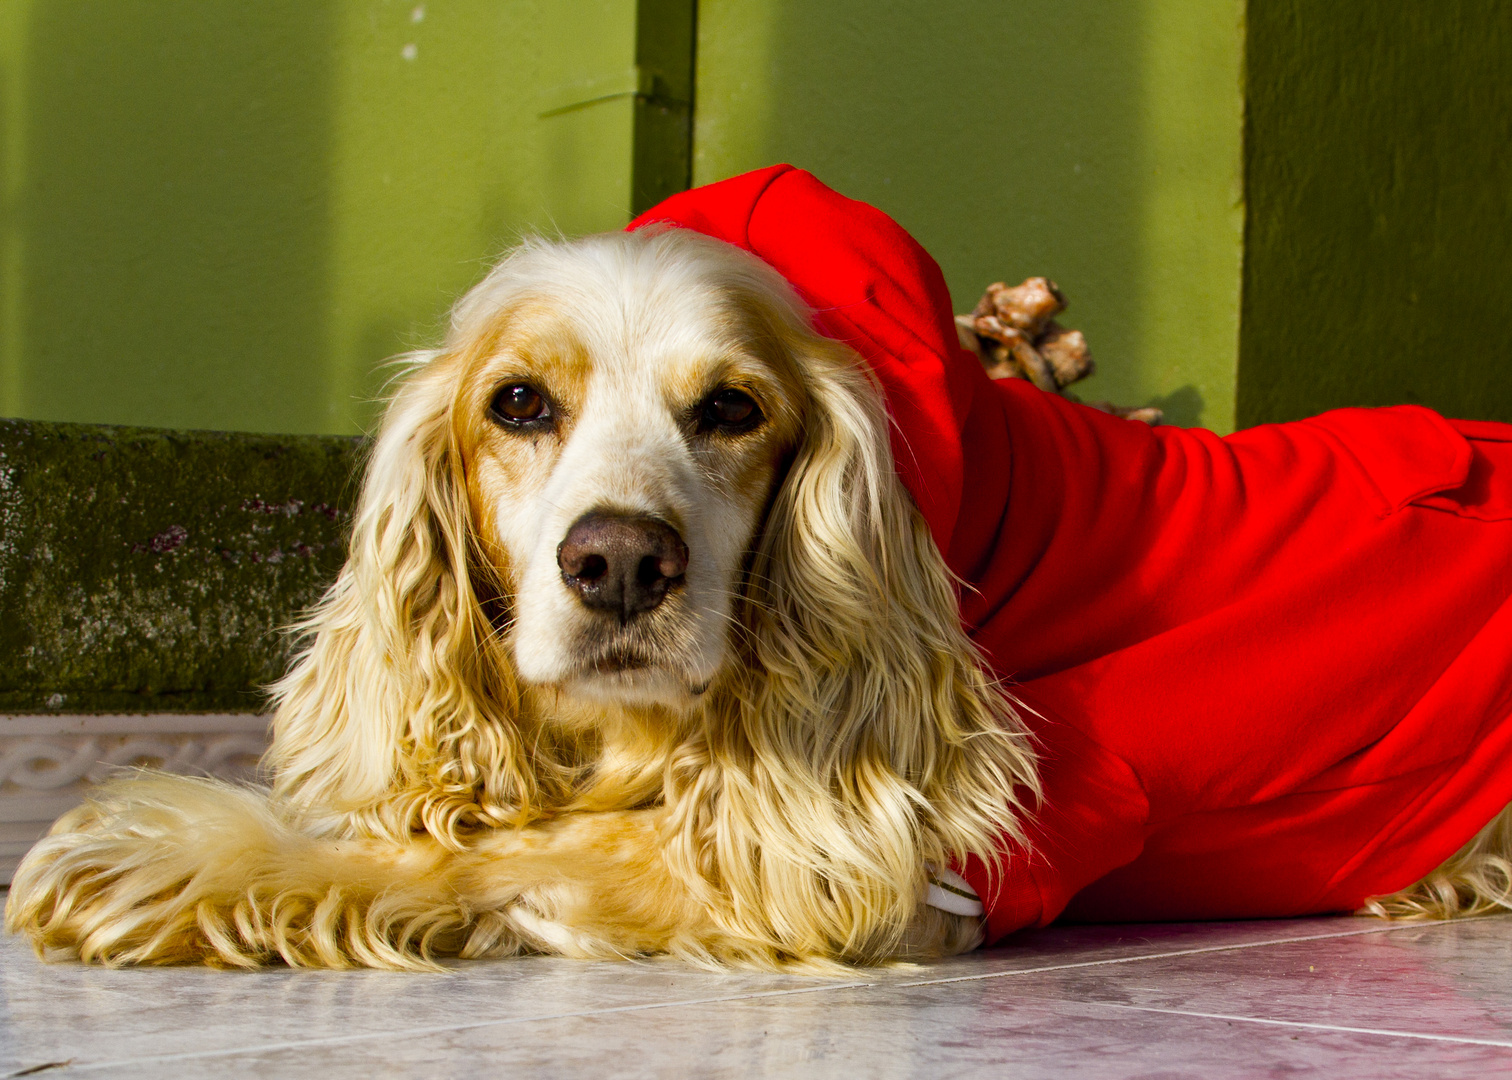 Pepe estrenando abrigo en estos días de frío